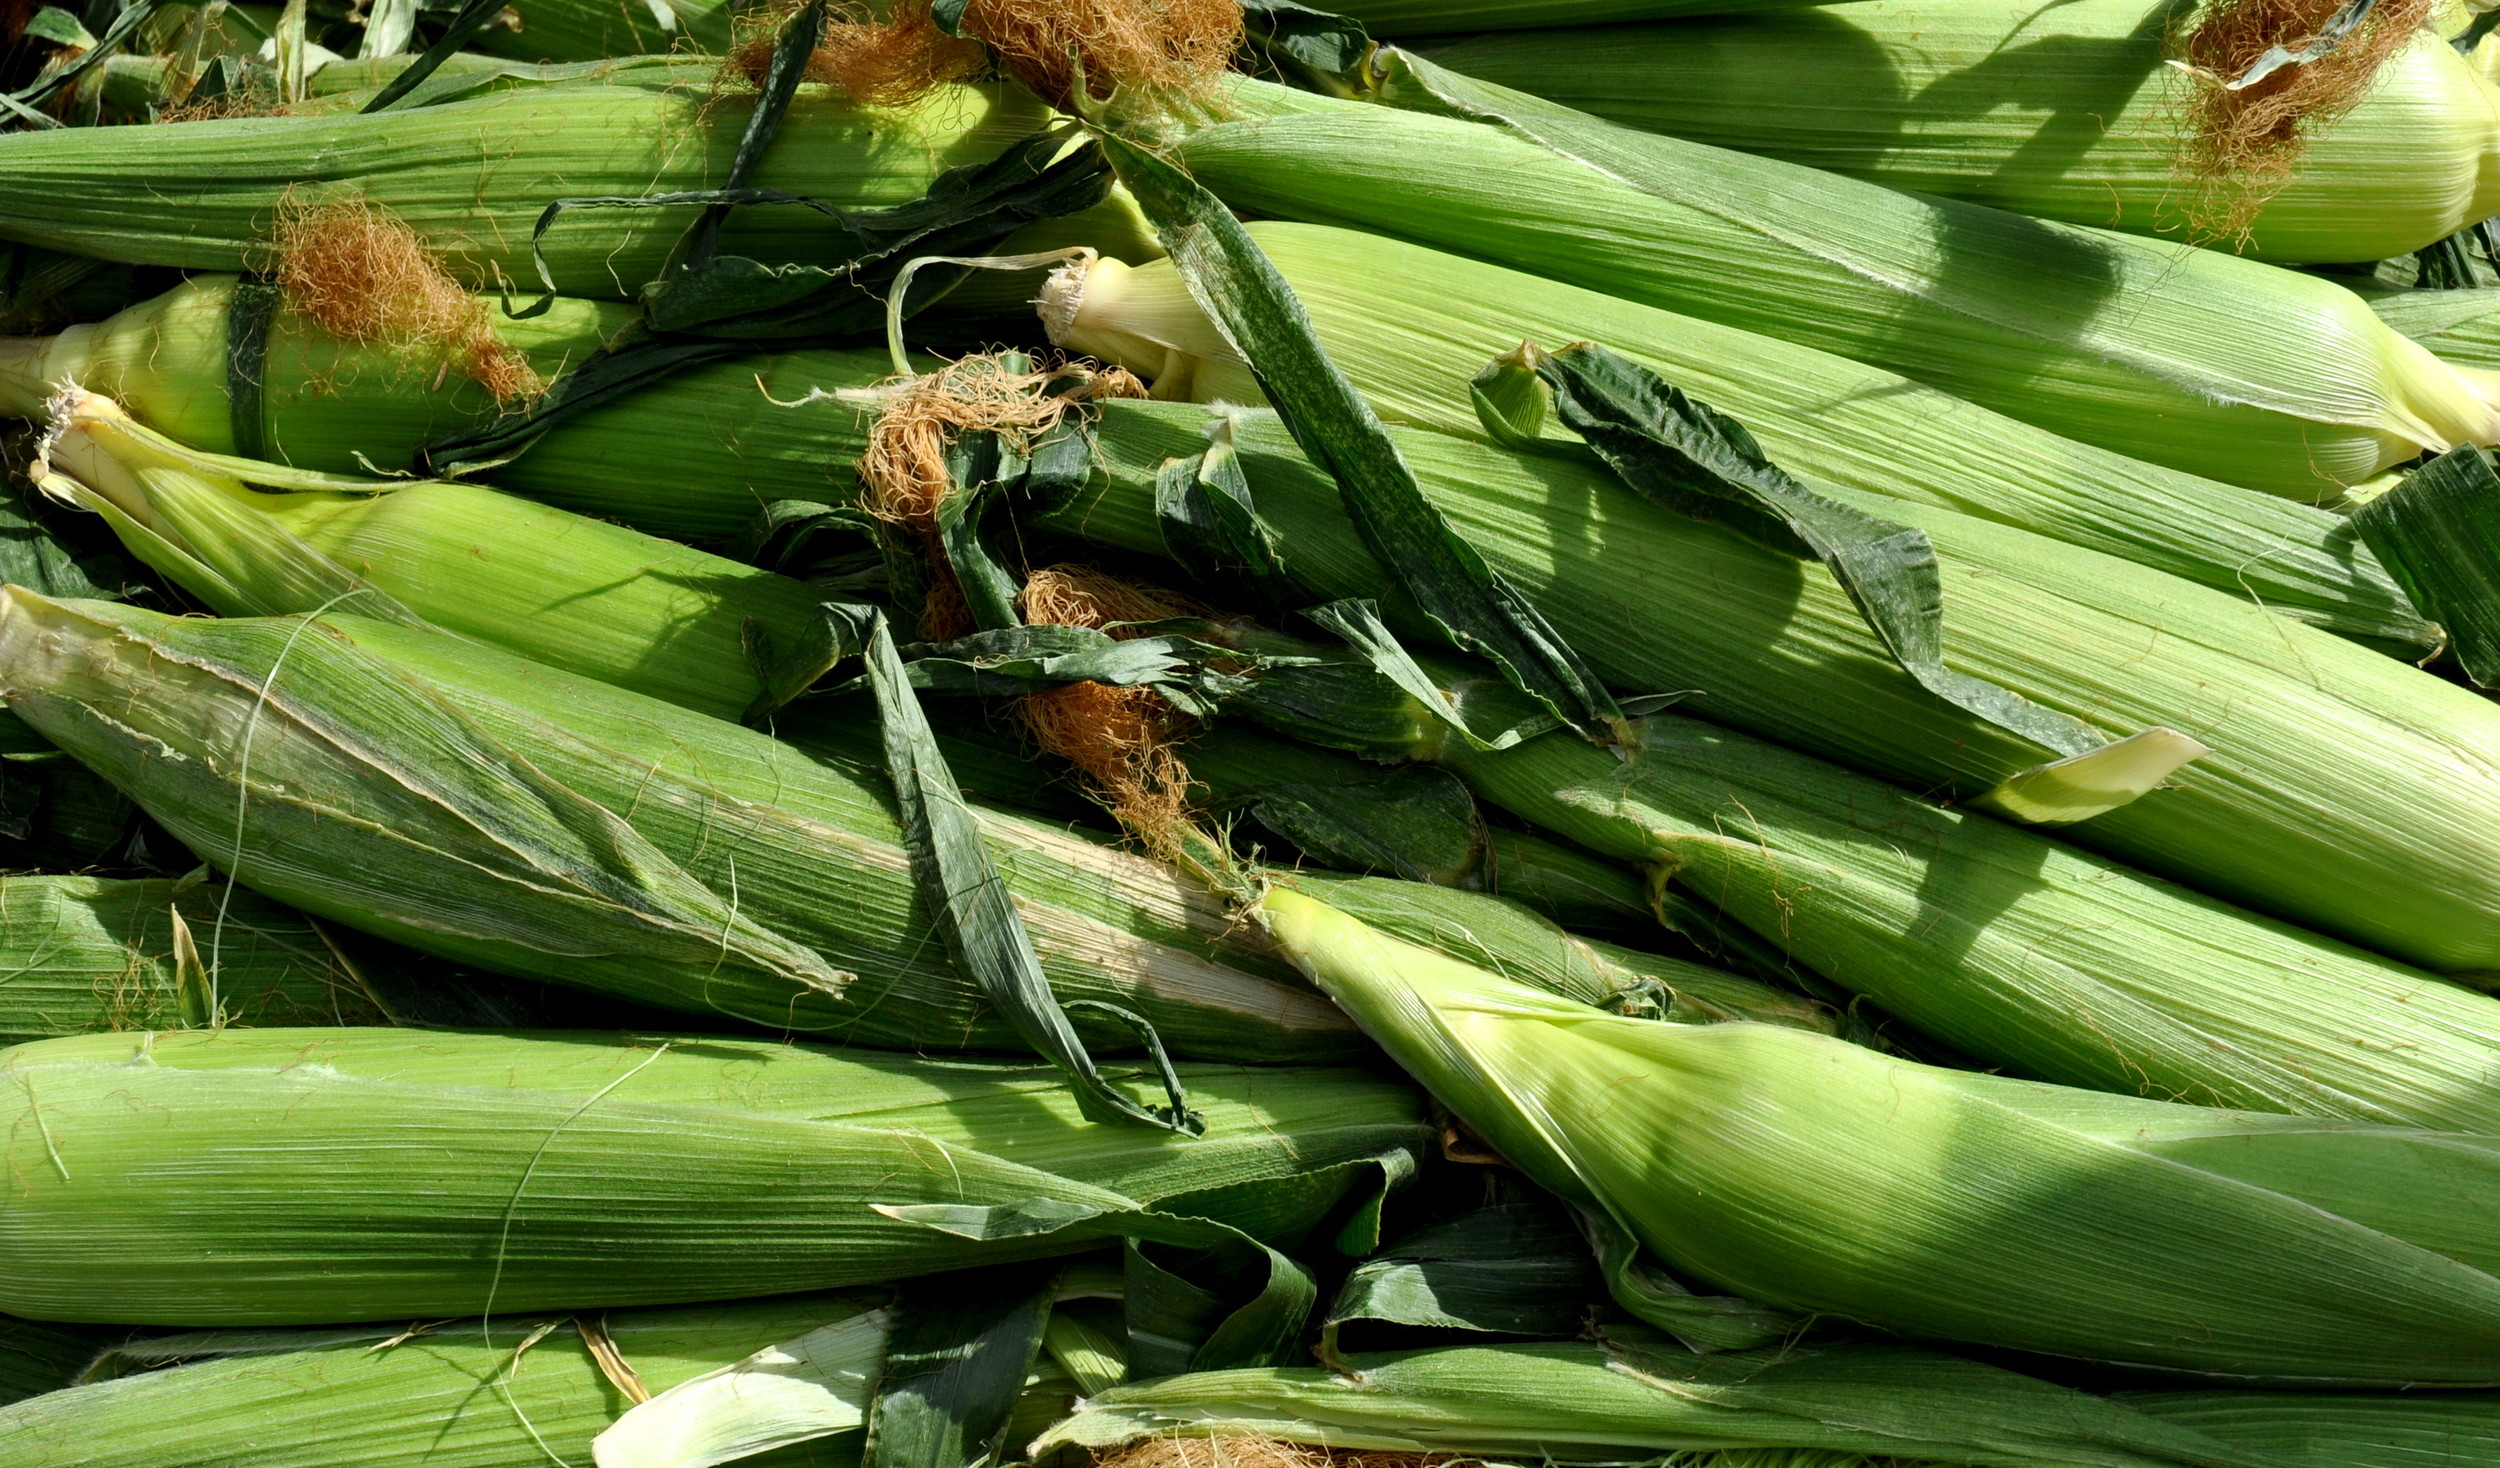 Organic sweet corn from Alvarez Organic Farms. Photo copyright 2013 by Zachary D. Lyons.